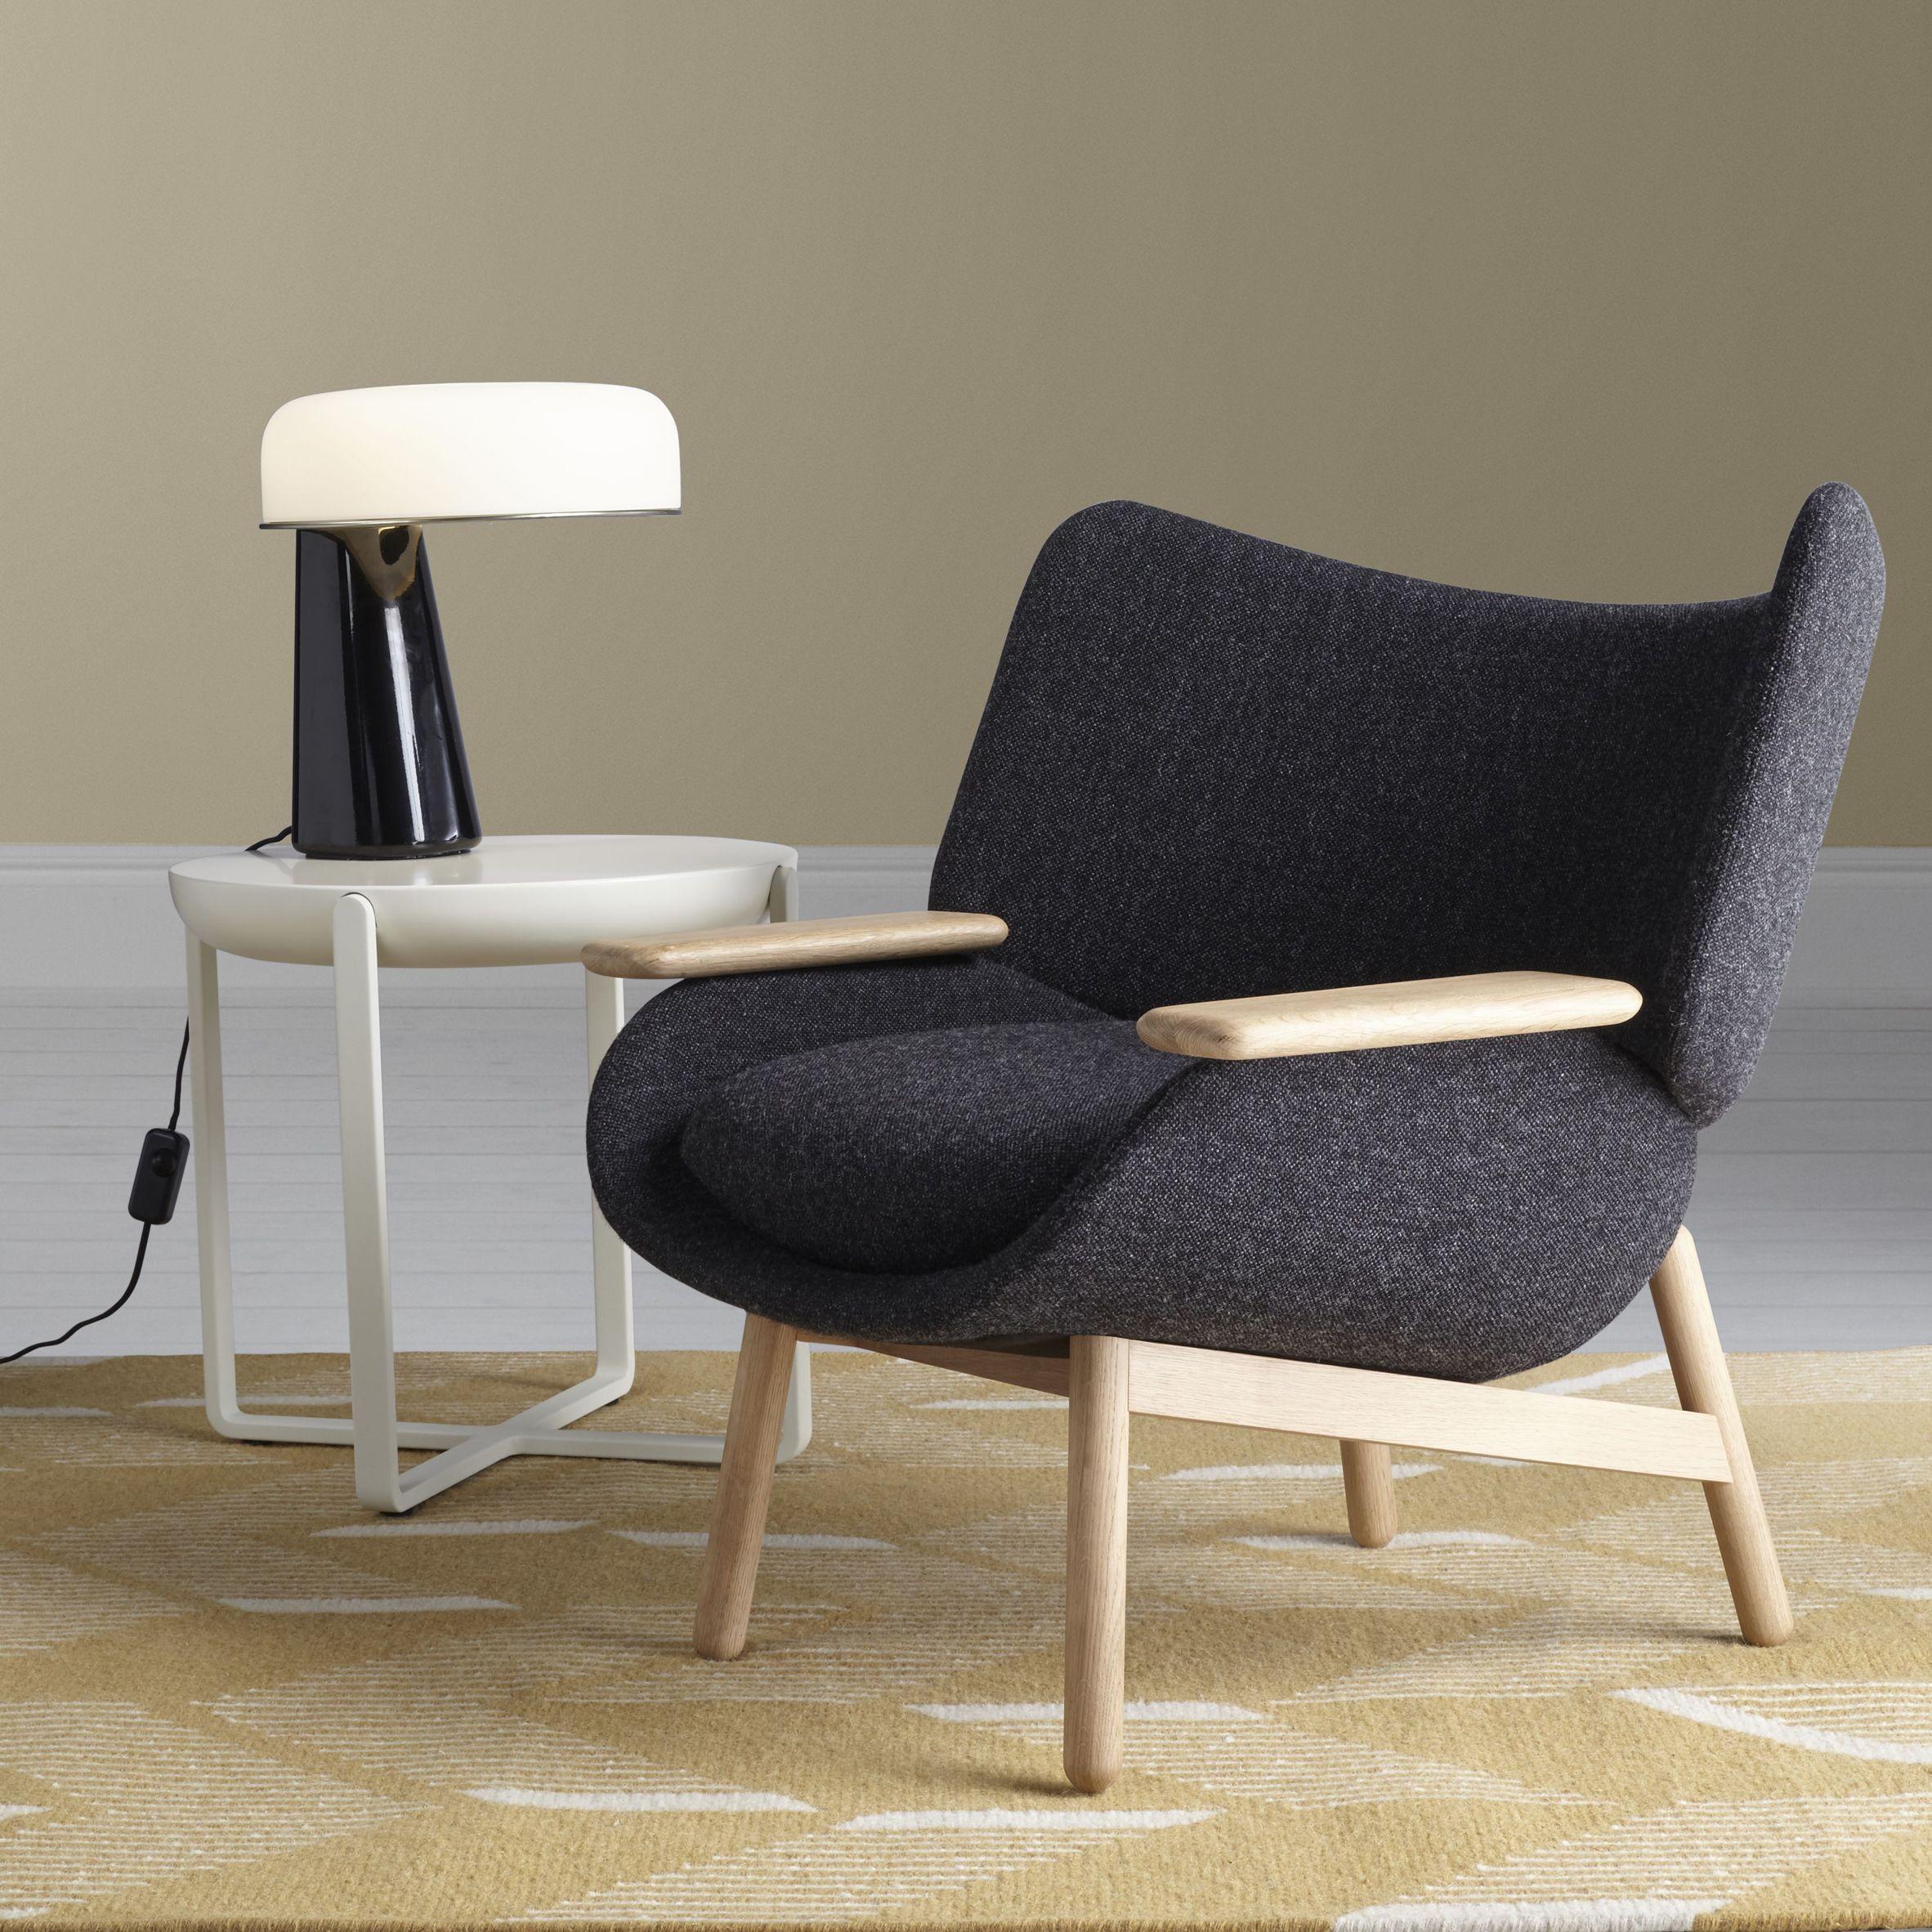 London studio Doshi Levien has created a furniture range for John ...